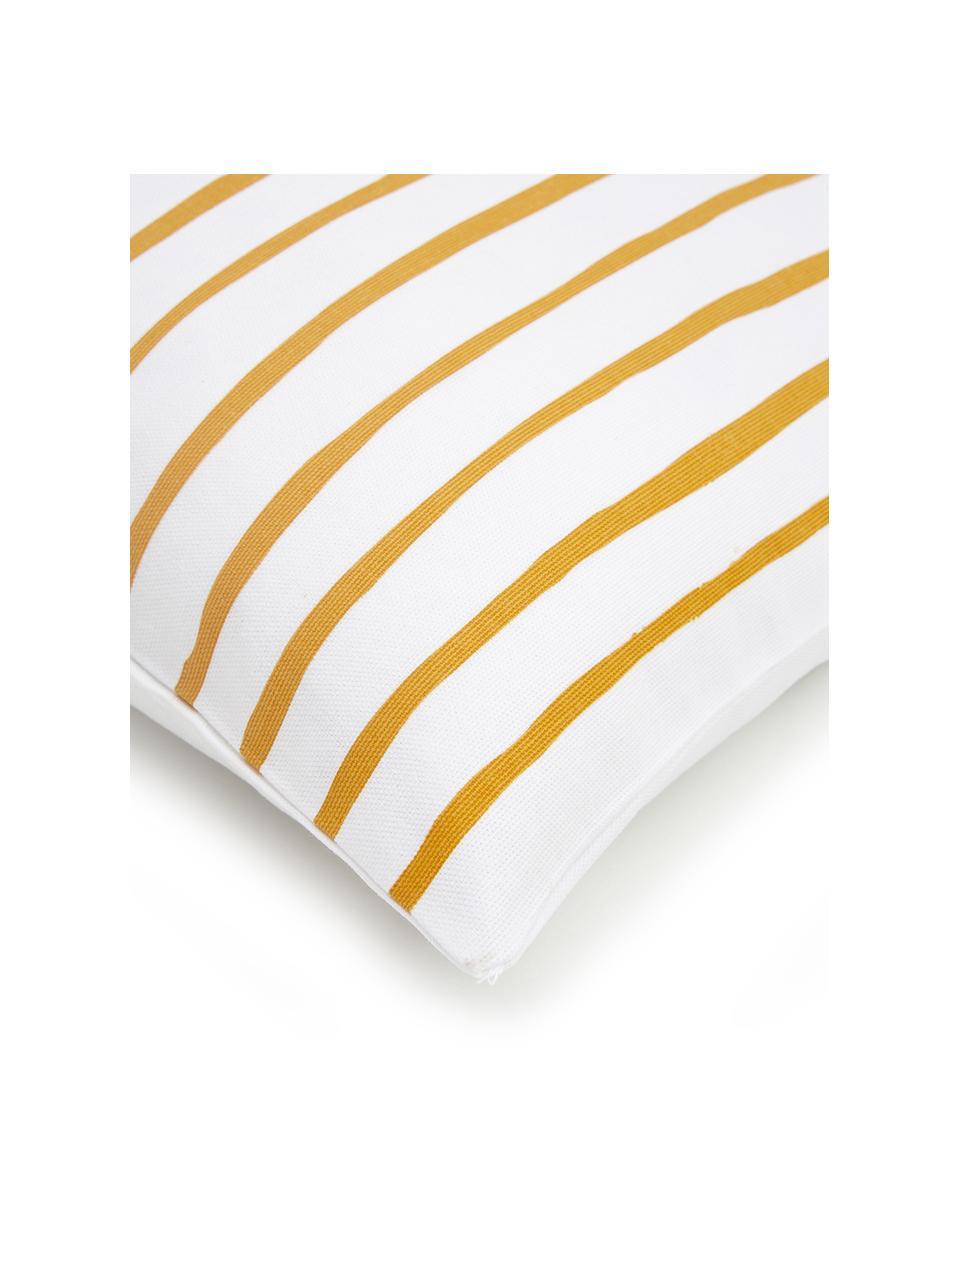 Federa arredo a righe gialla/bianca Ola, 100% cotone, Giallo, bianco, Larg. 40 x Lung. 40 cm